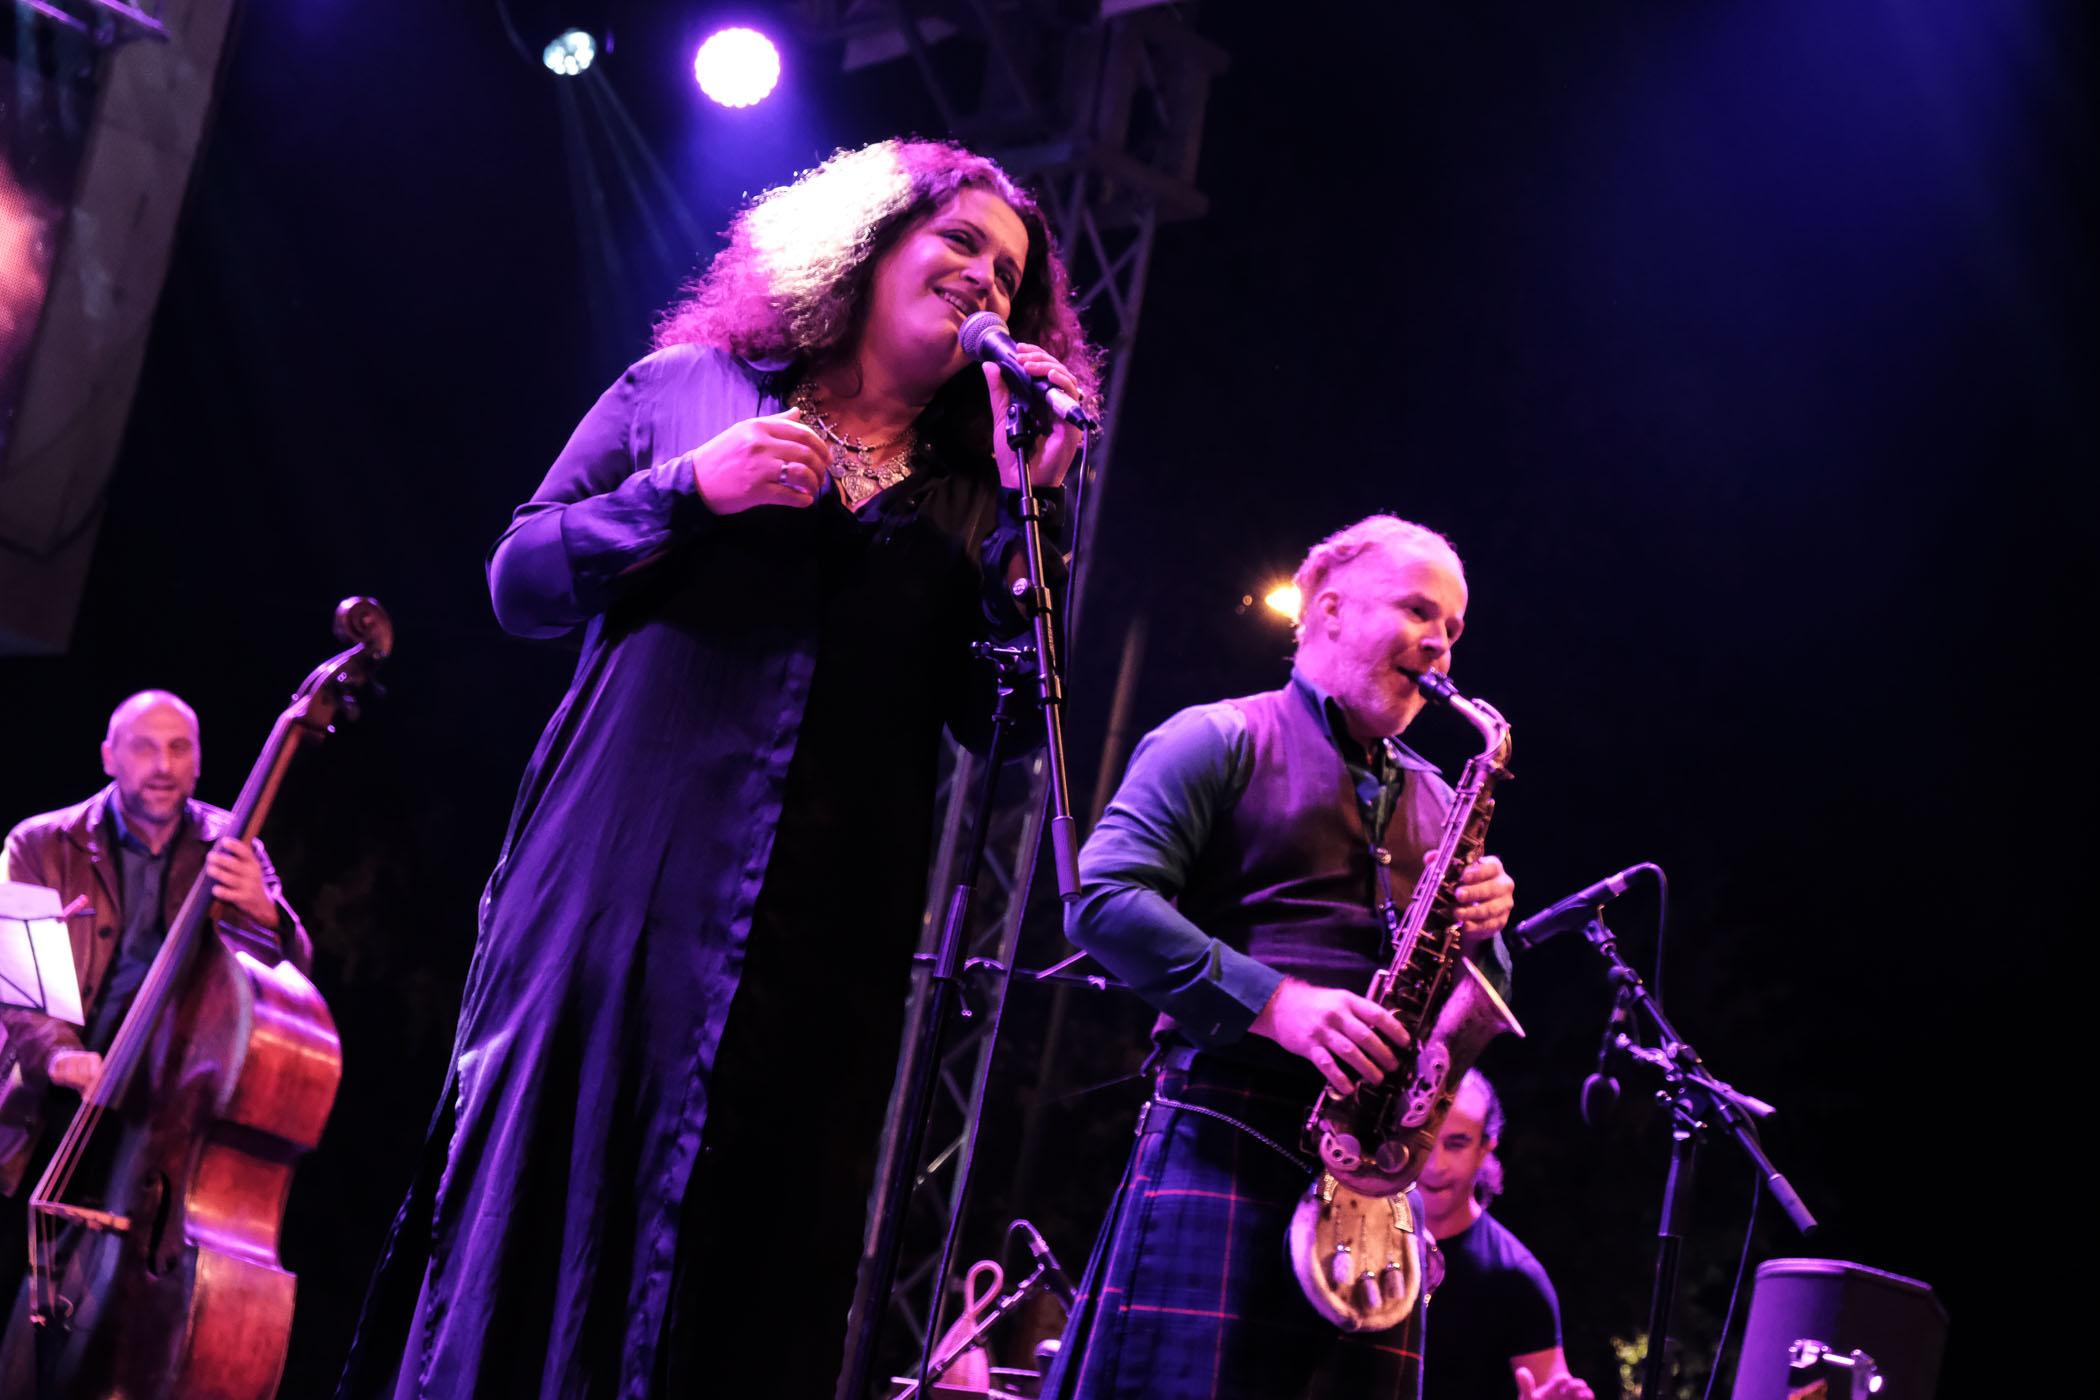 Amazing Eda Zari and her band, including world-renowned percussionist Rhani Krija © Nick St. Oegger